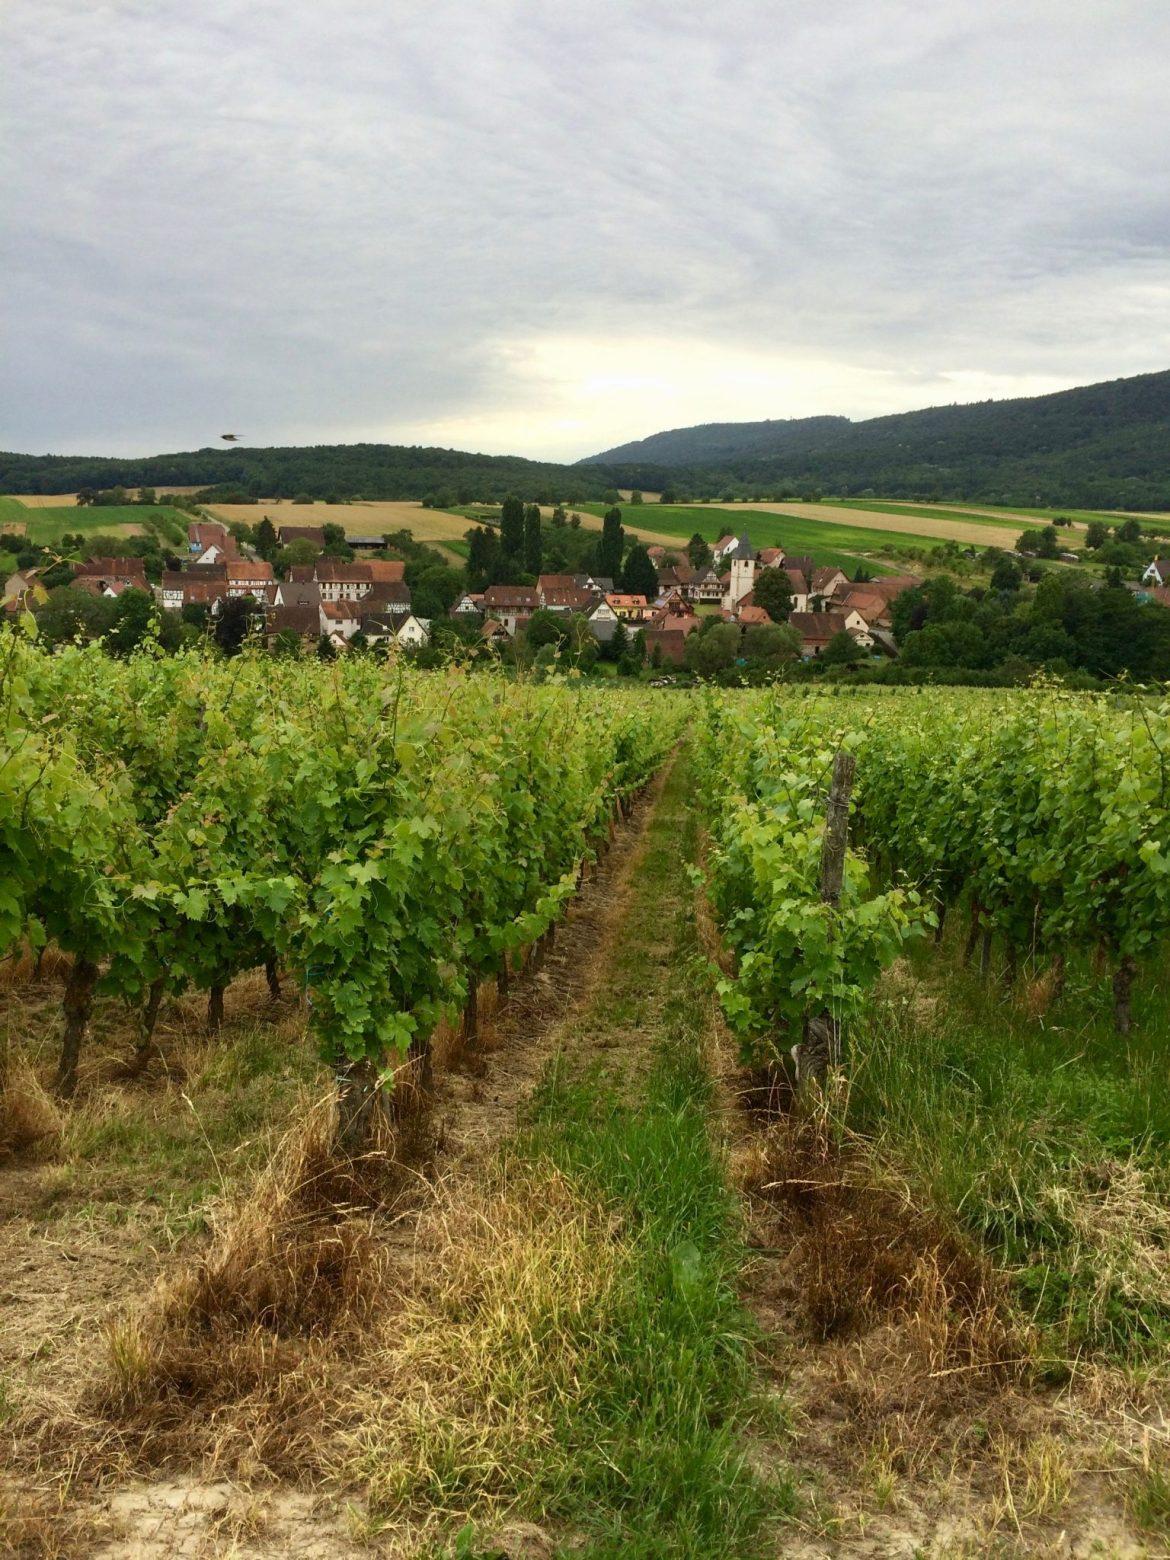 Vineyards in Alsace